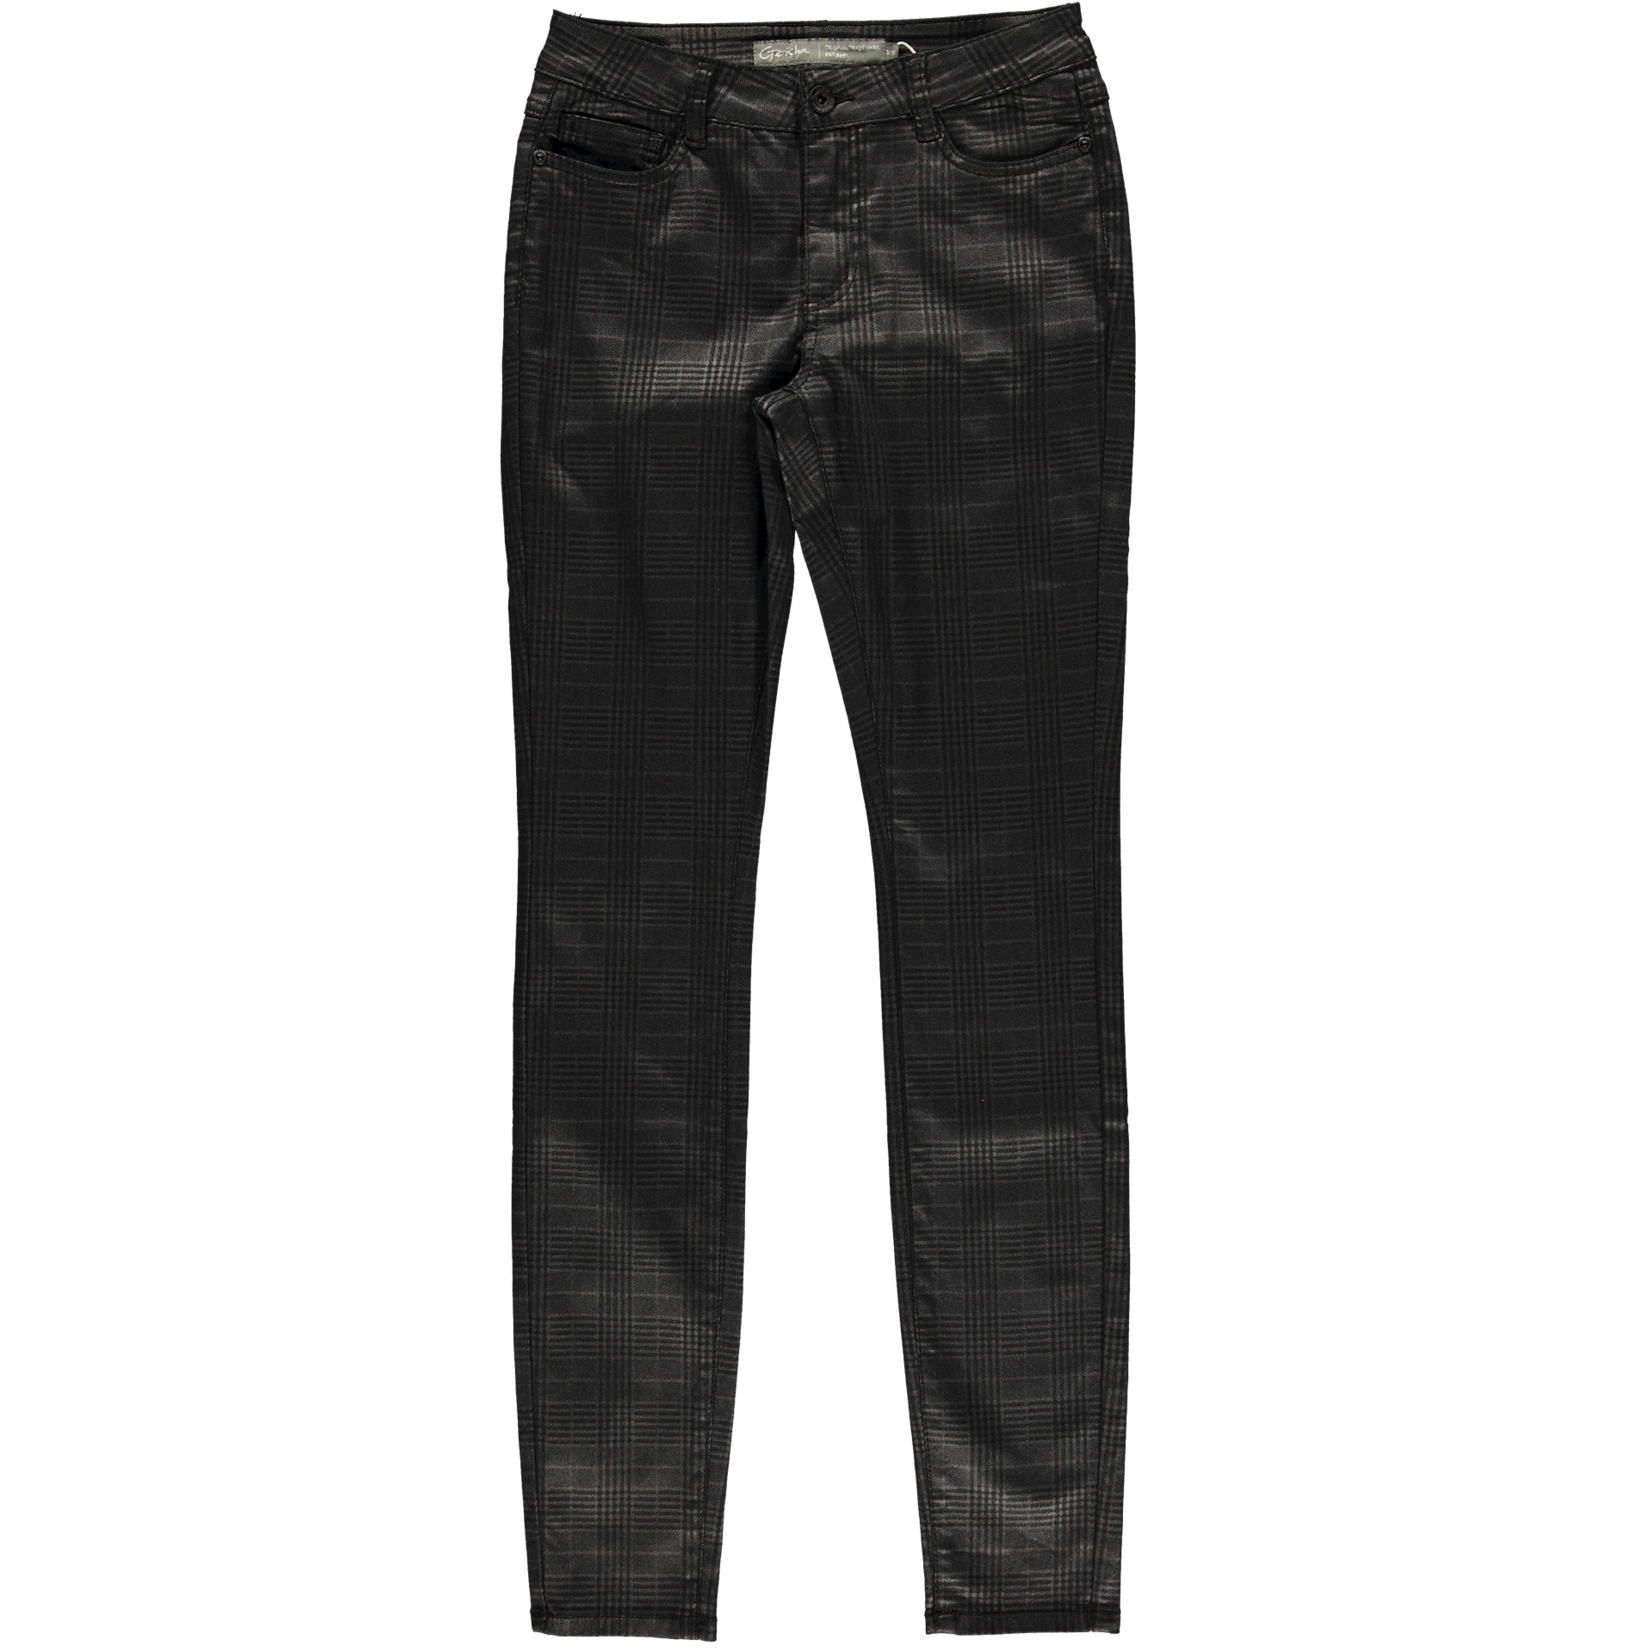 Geisha Geisha Pants Check Black 11515-10